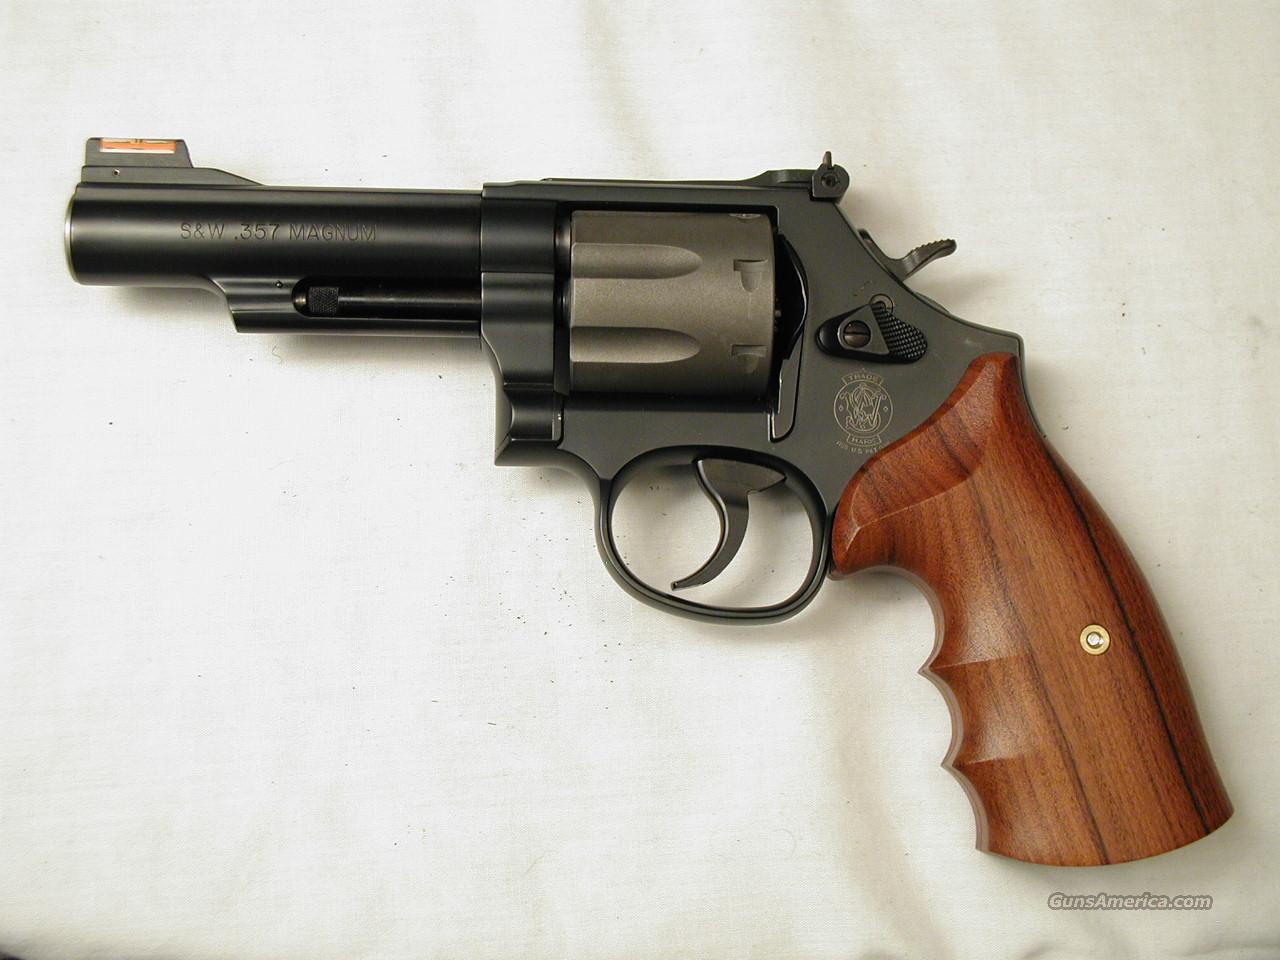 7 SHOT 357 MAGNUM  Guns > Pistols > Smith & Wesson Revolvers > Full Frame Revolver